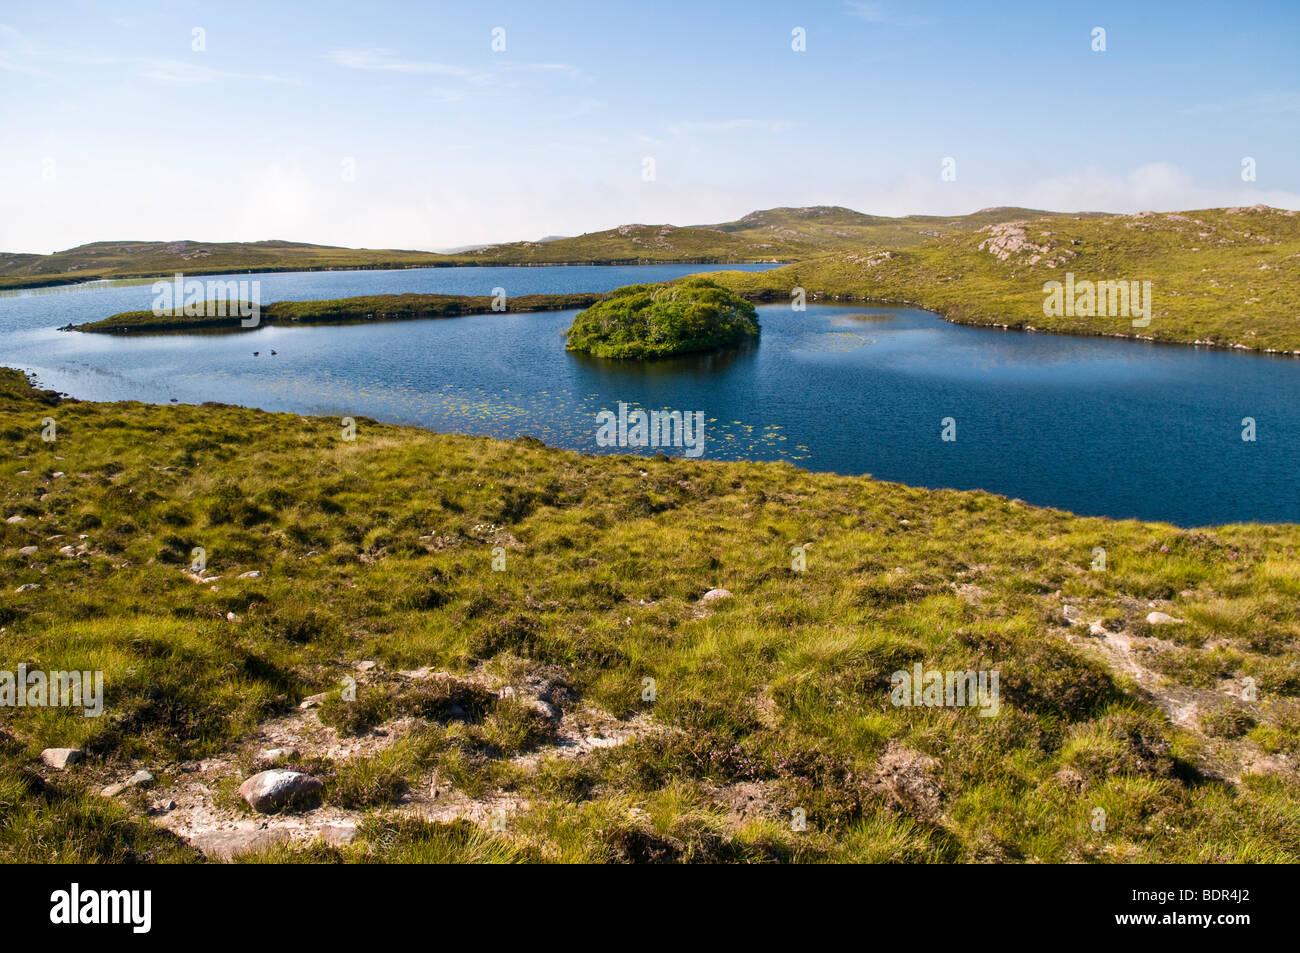 One of the many lochs (lakes) near Cove, Scotland, UK - Stock Image